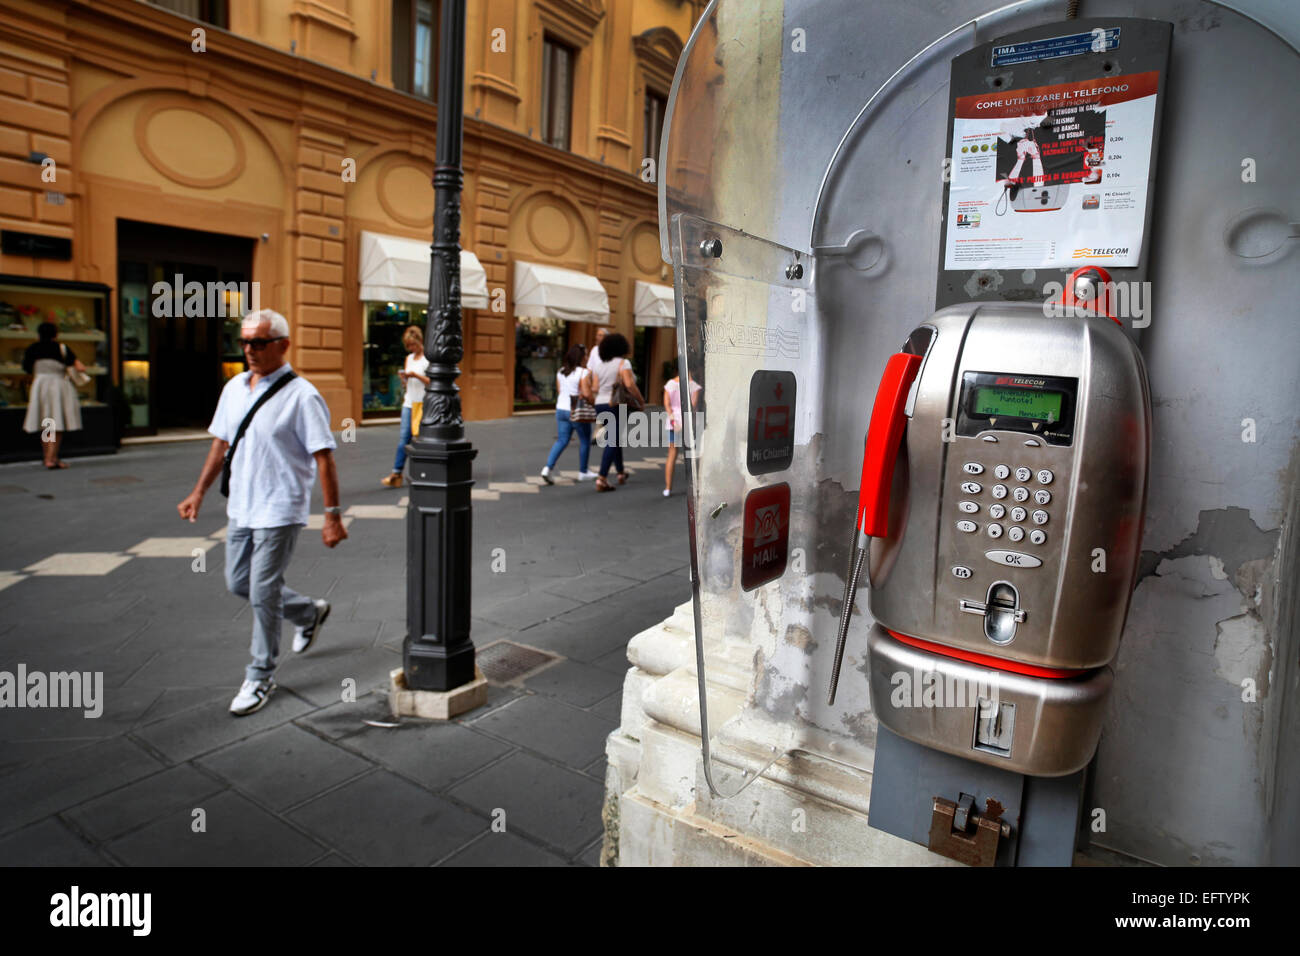 Telecom Italia payphone in Chieti, Italy. - Stock Image